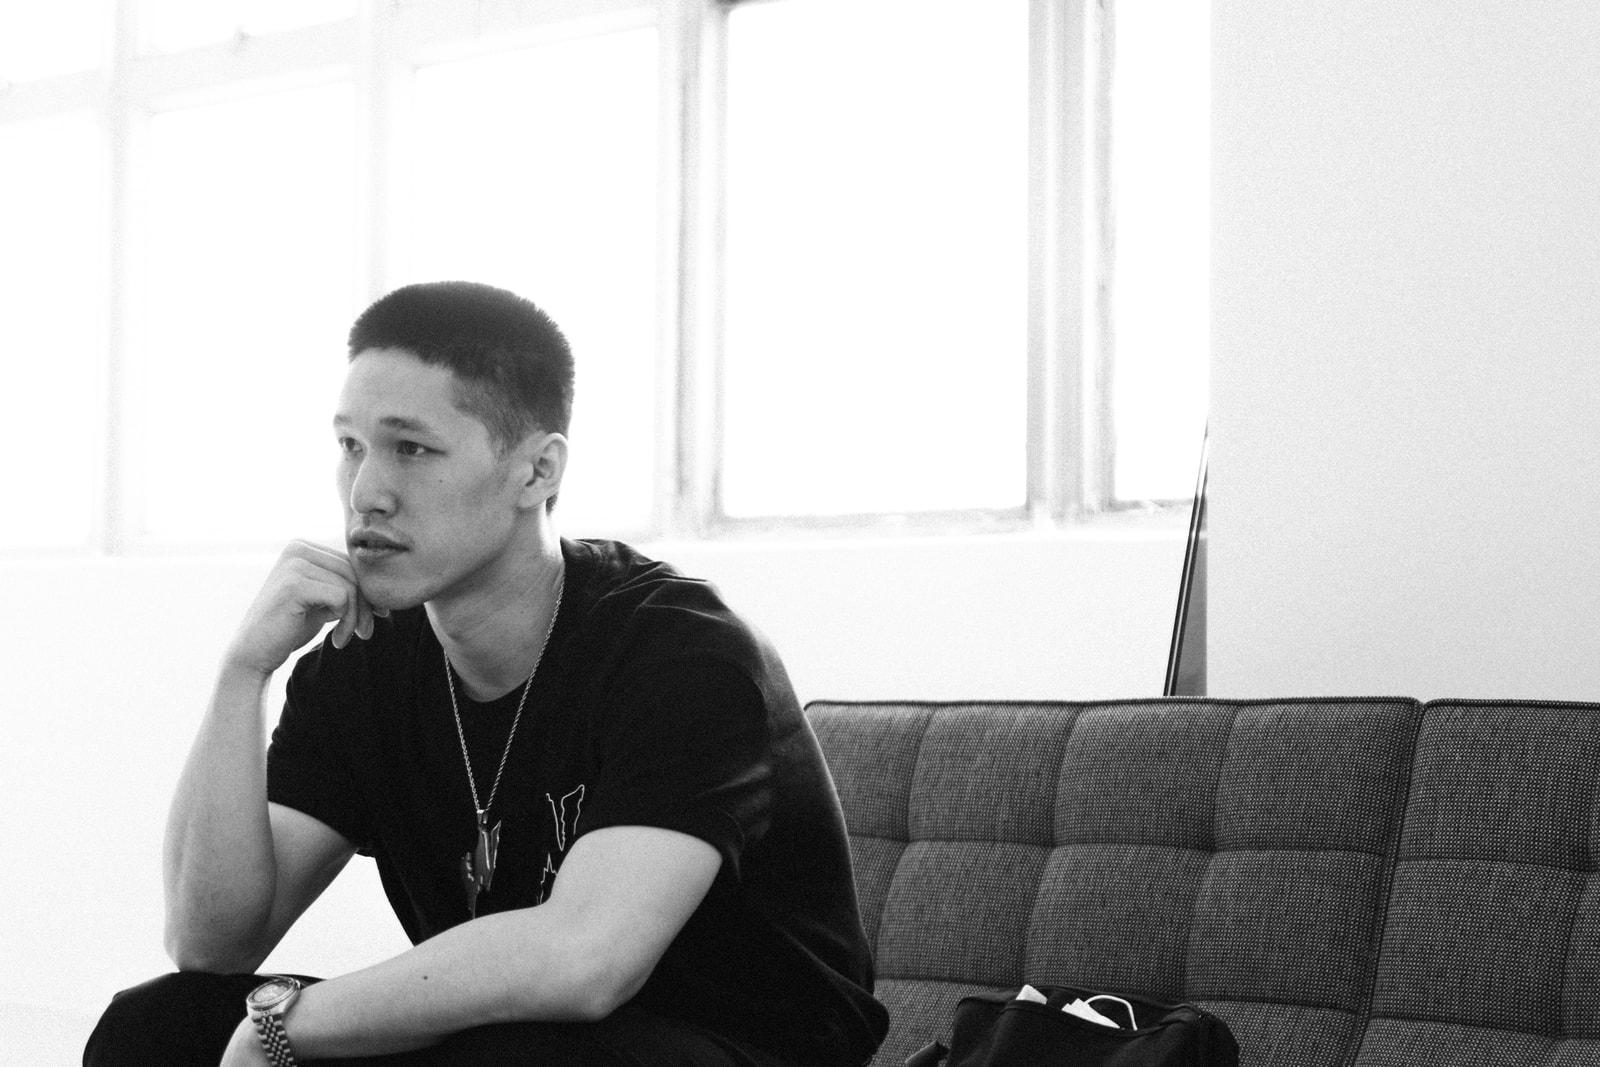 HYPEBEAST 獨家專訪 Matt Force:我想透過說唱去探究人性。